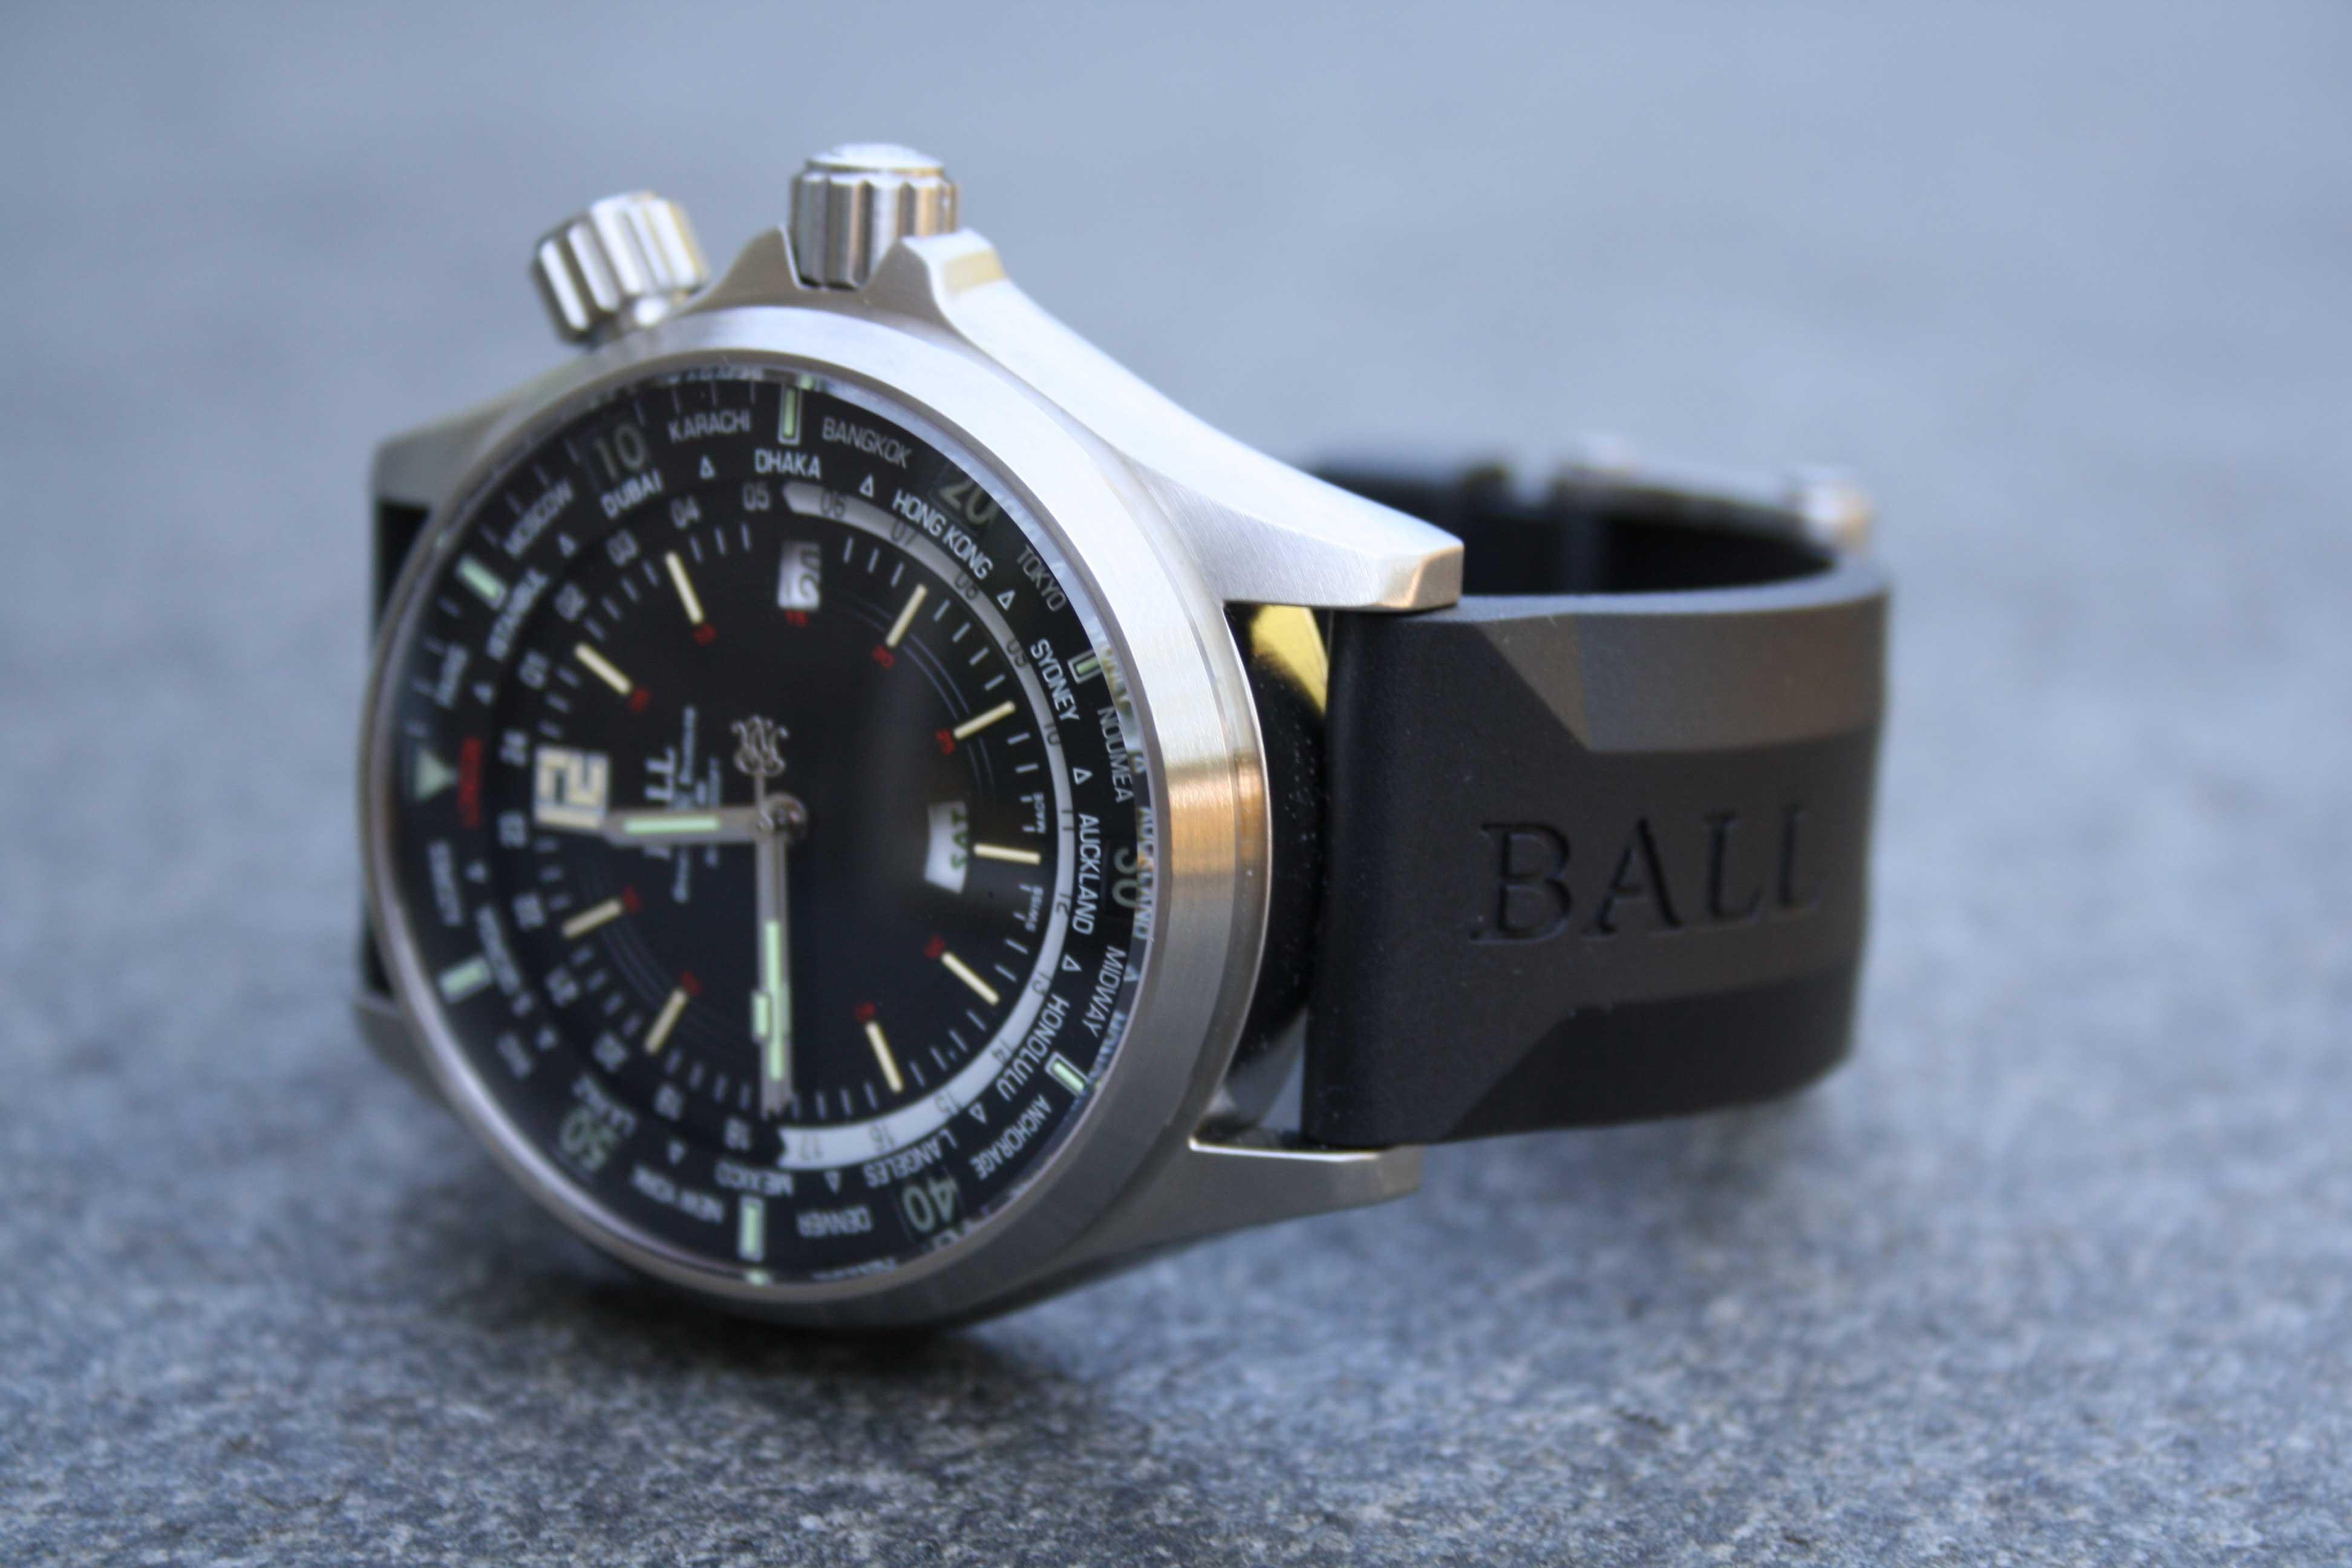 Ball Watch Co.©